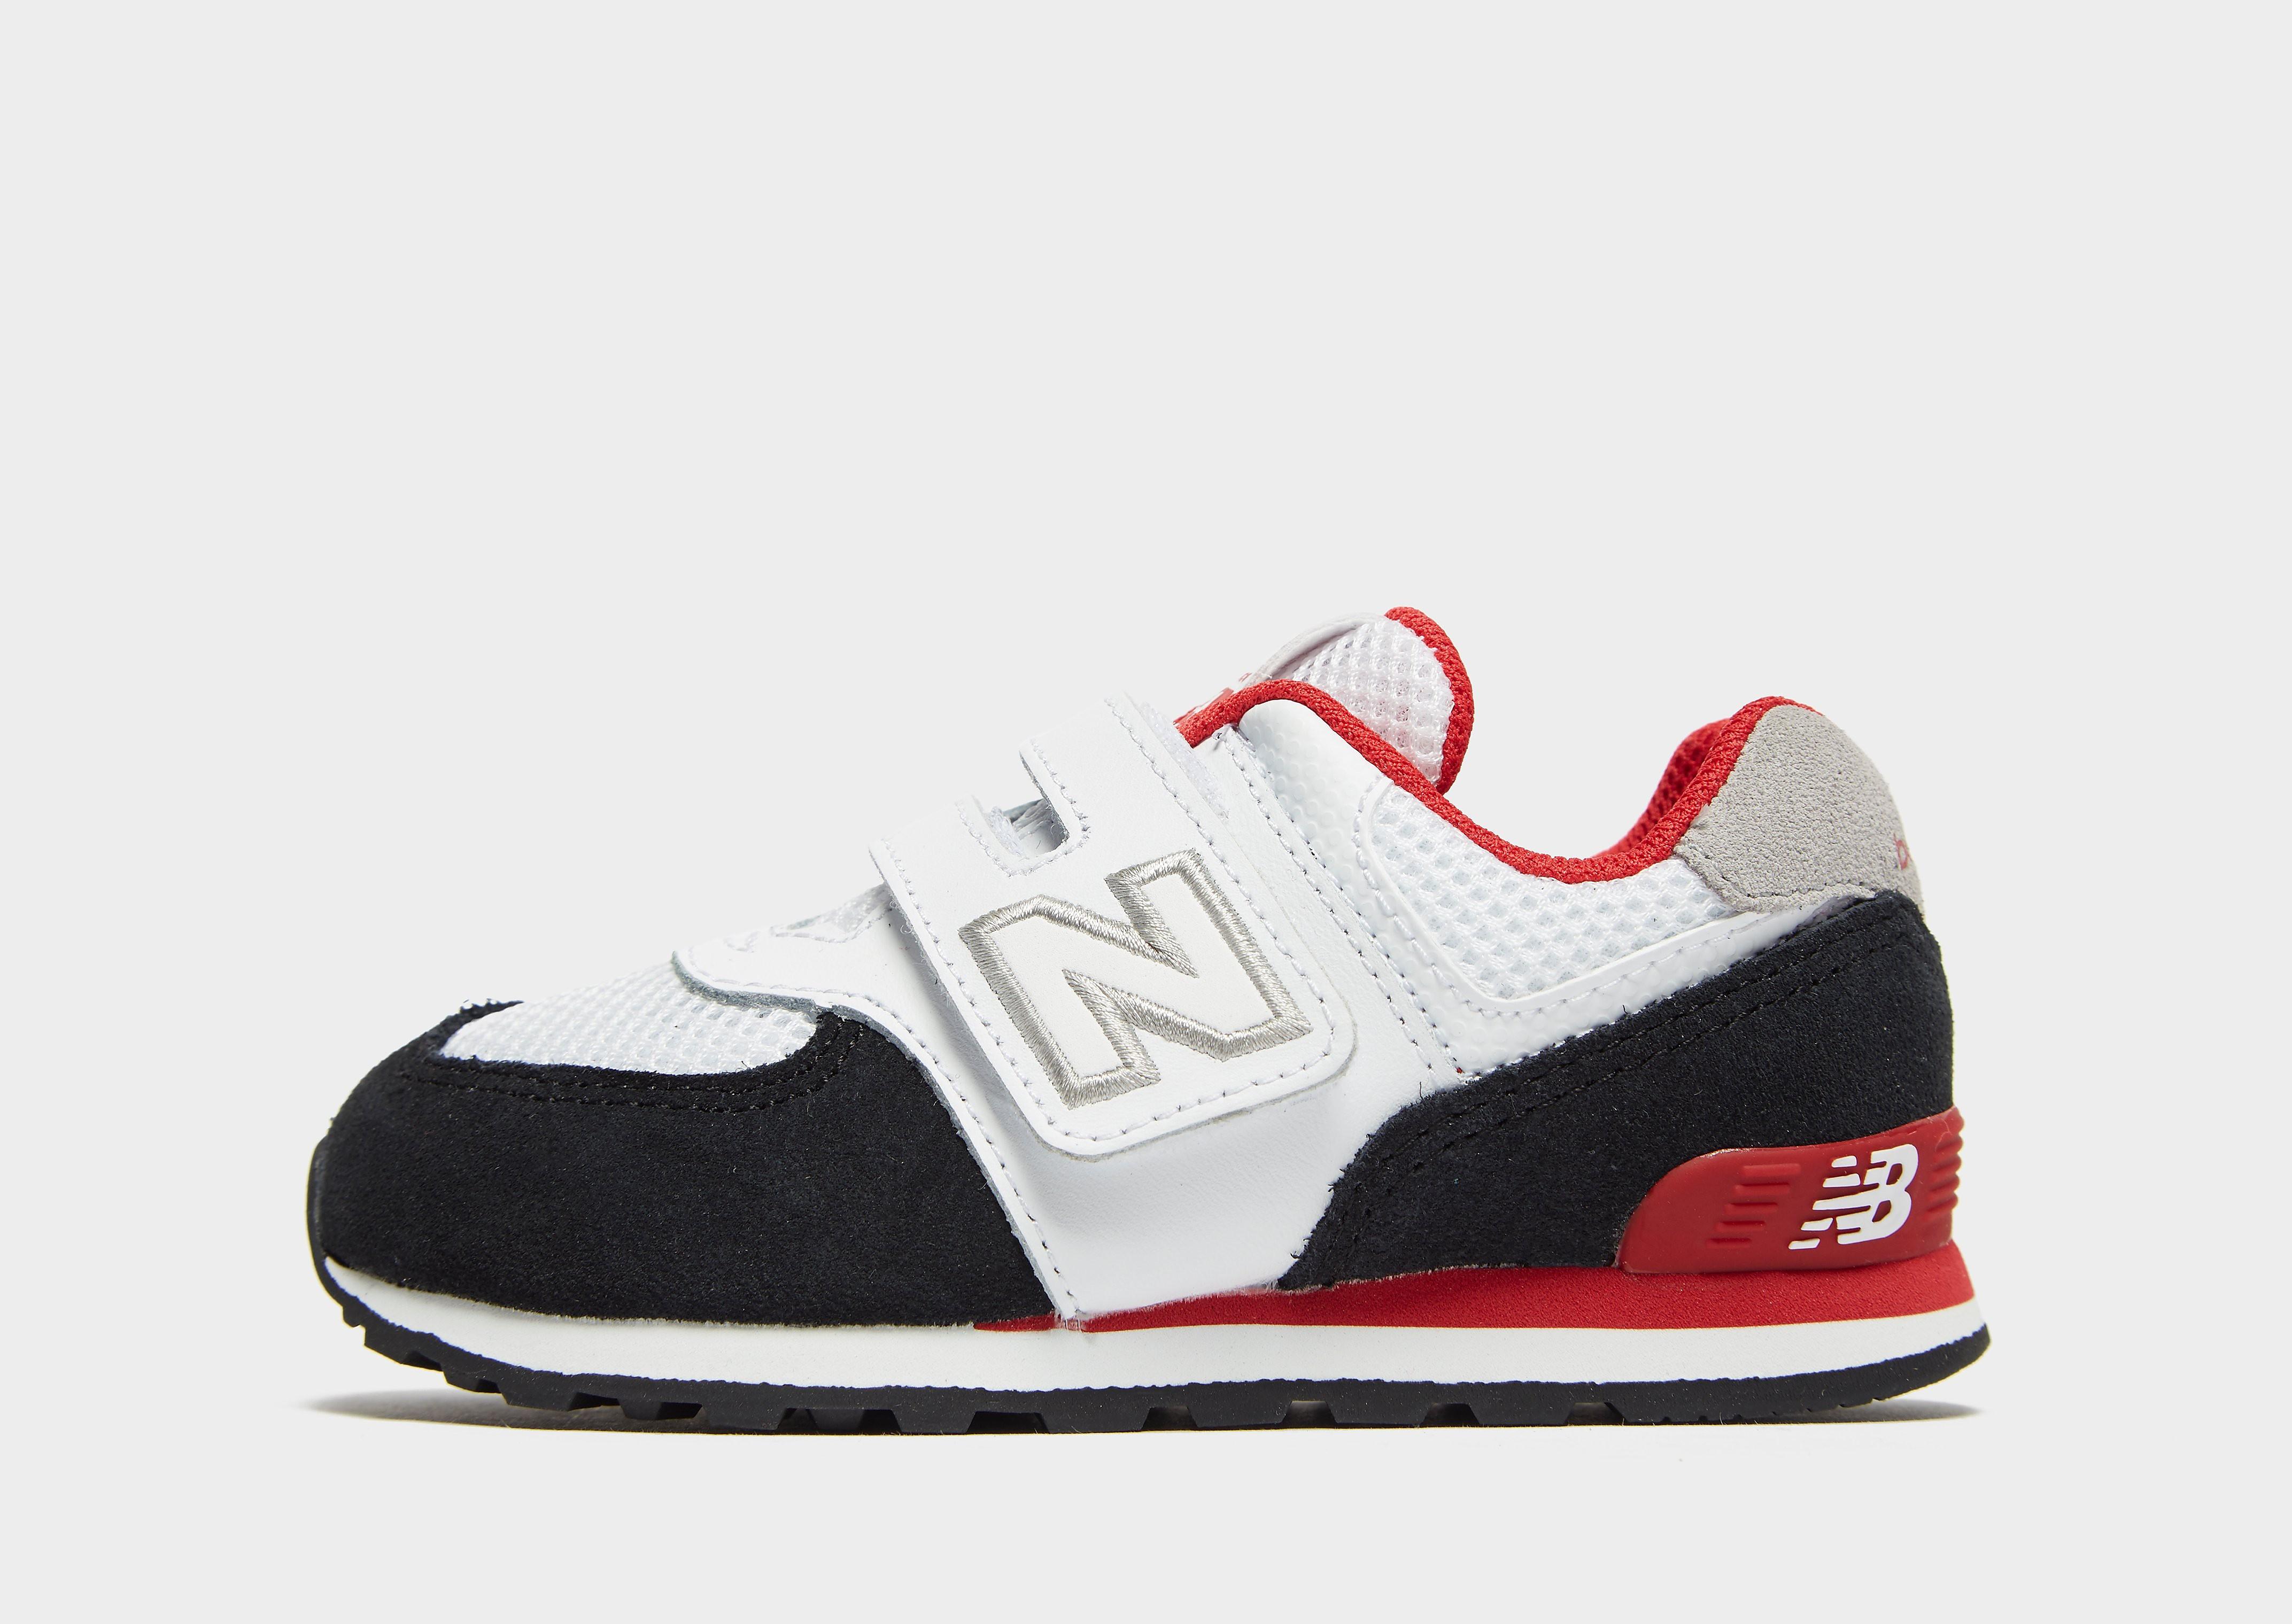 New Balance 574 kindersneaker wit, zwart en rood